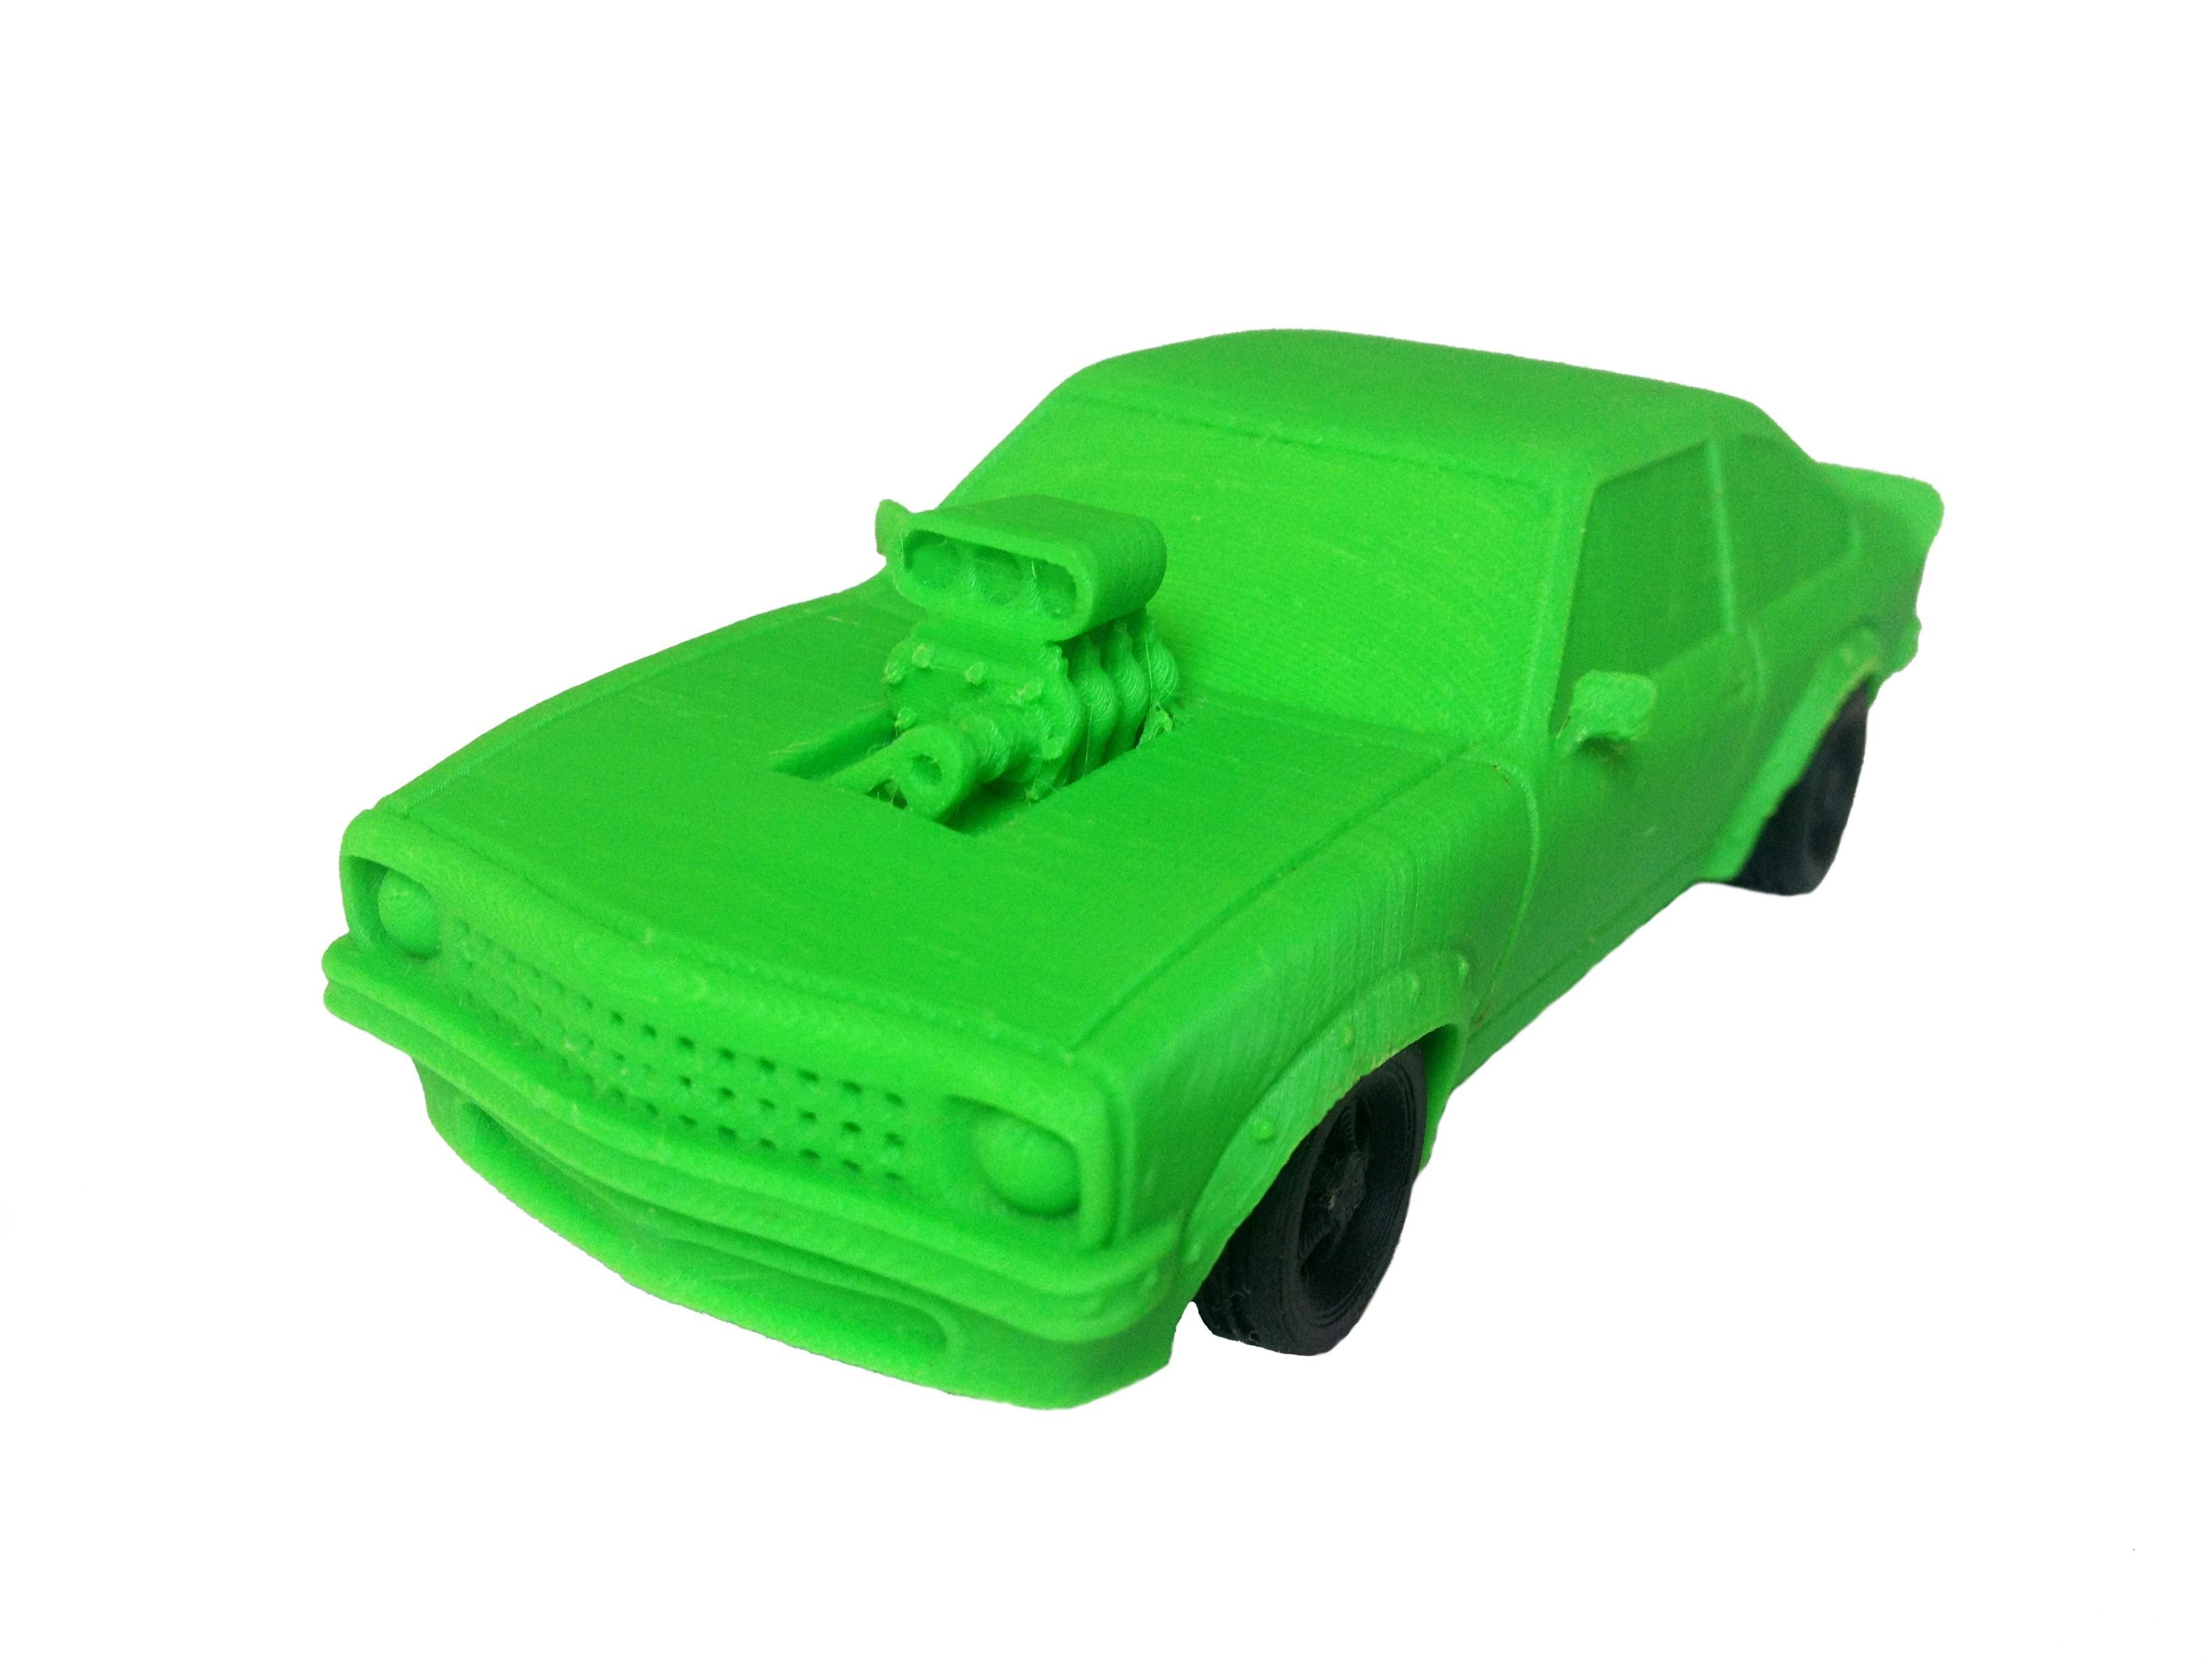 car front.JPG Download STL file Holden Torana A9X Supercharger • 3D print model, Custom3DPrinting